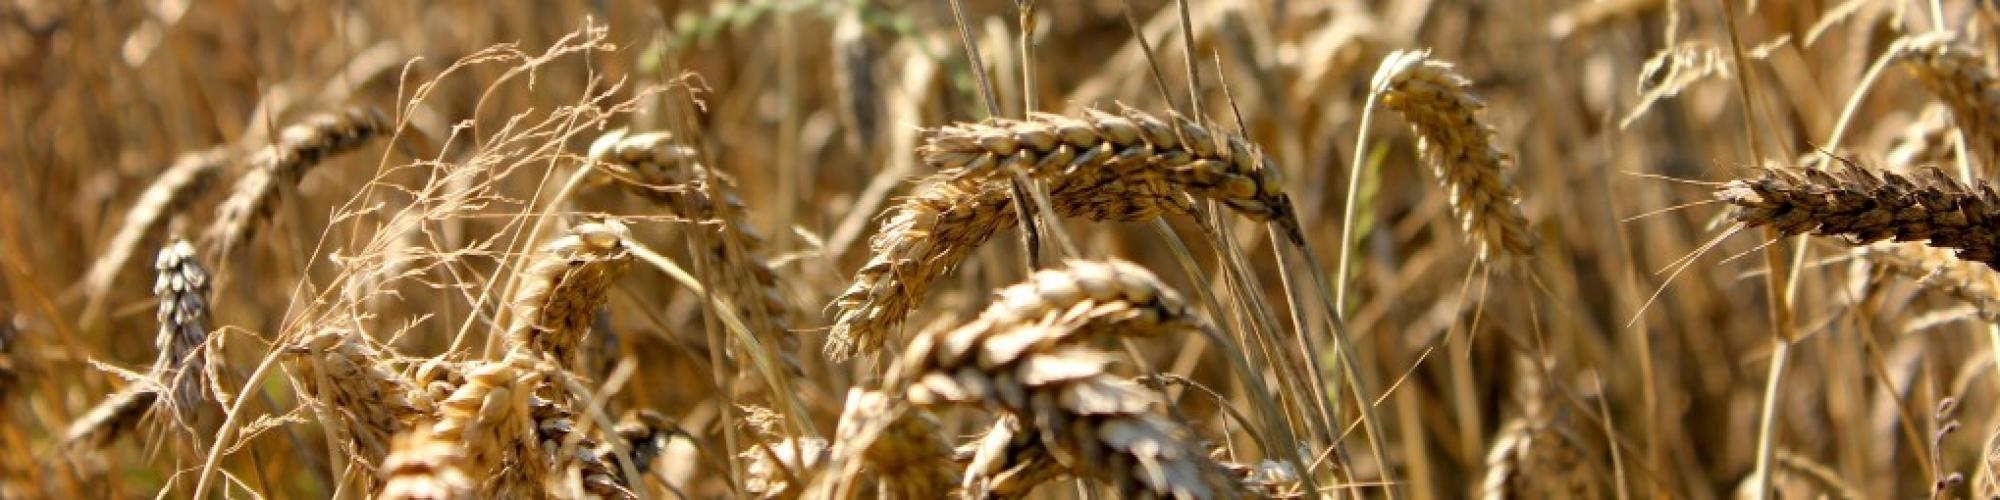 HEINRICH GOES Agrarhandel